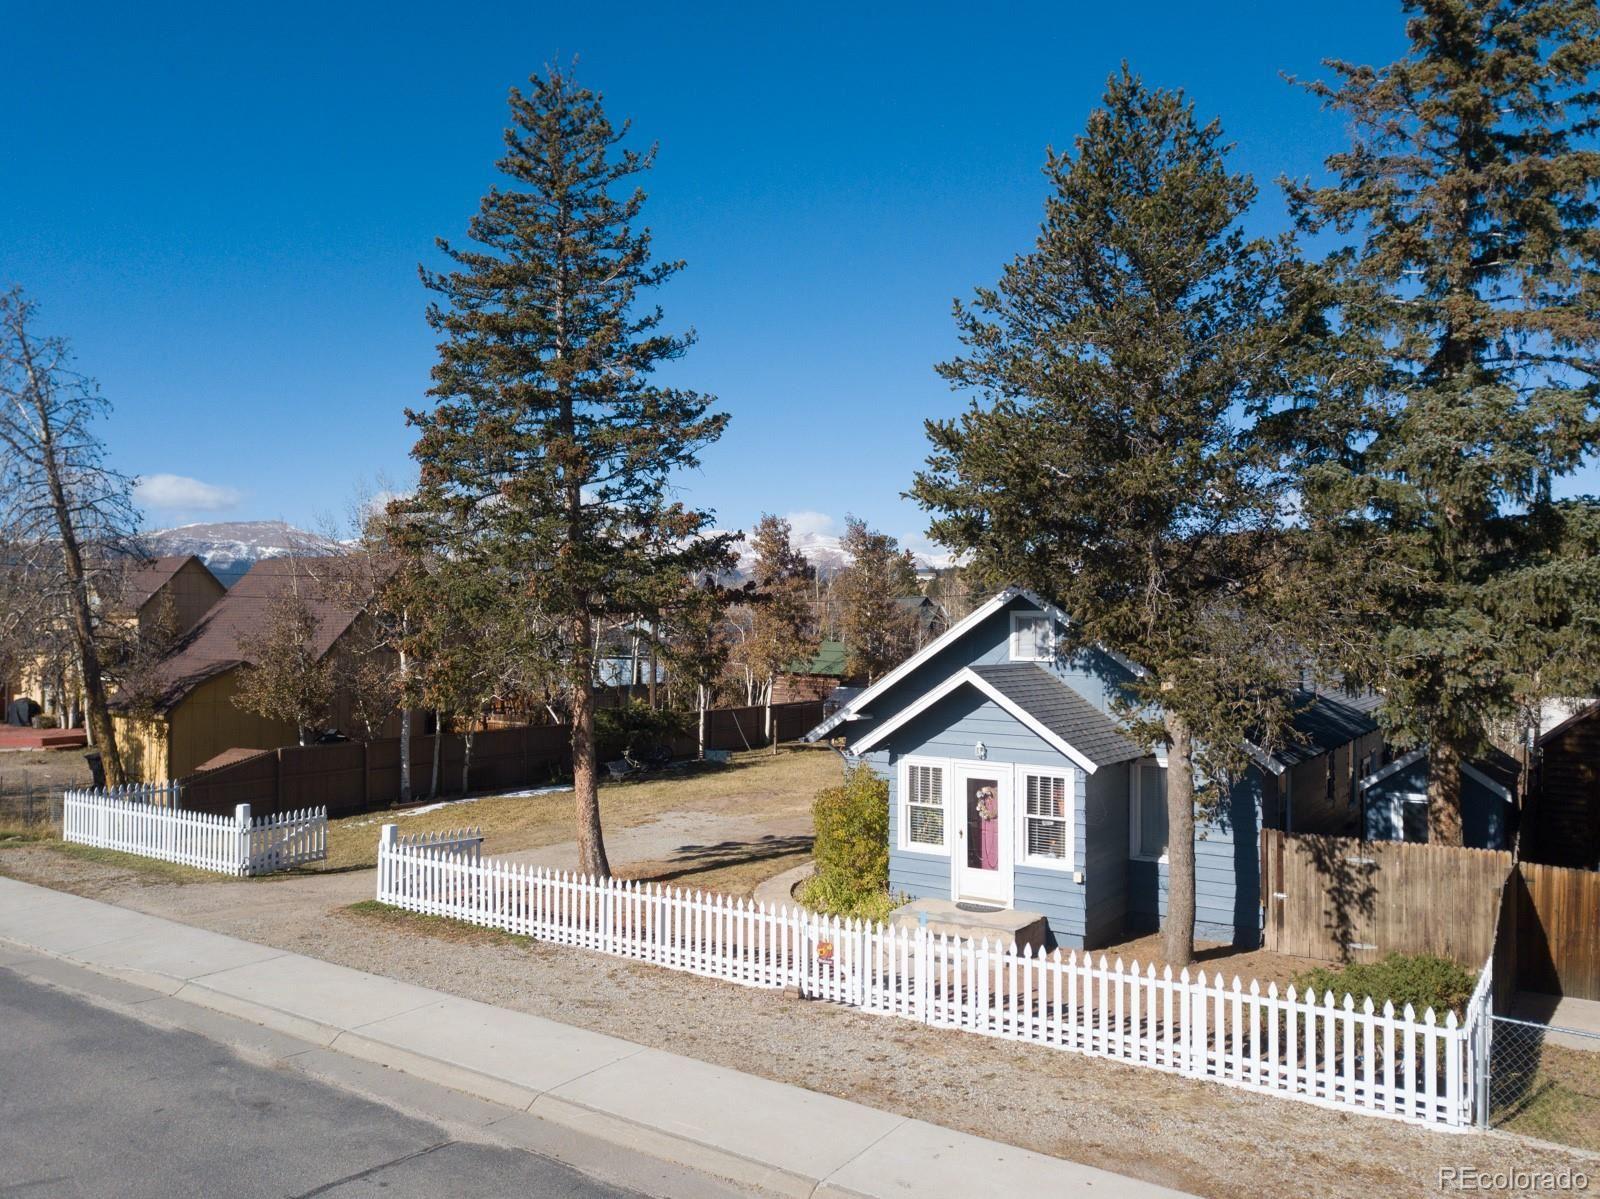 Photo of 580 6th Street, Fairplay, CO 80440 (MLS # 9726341)